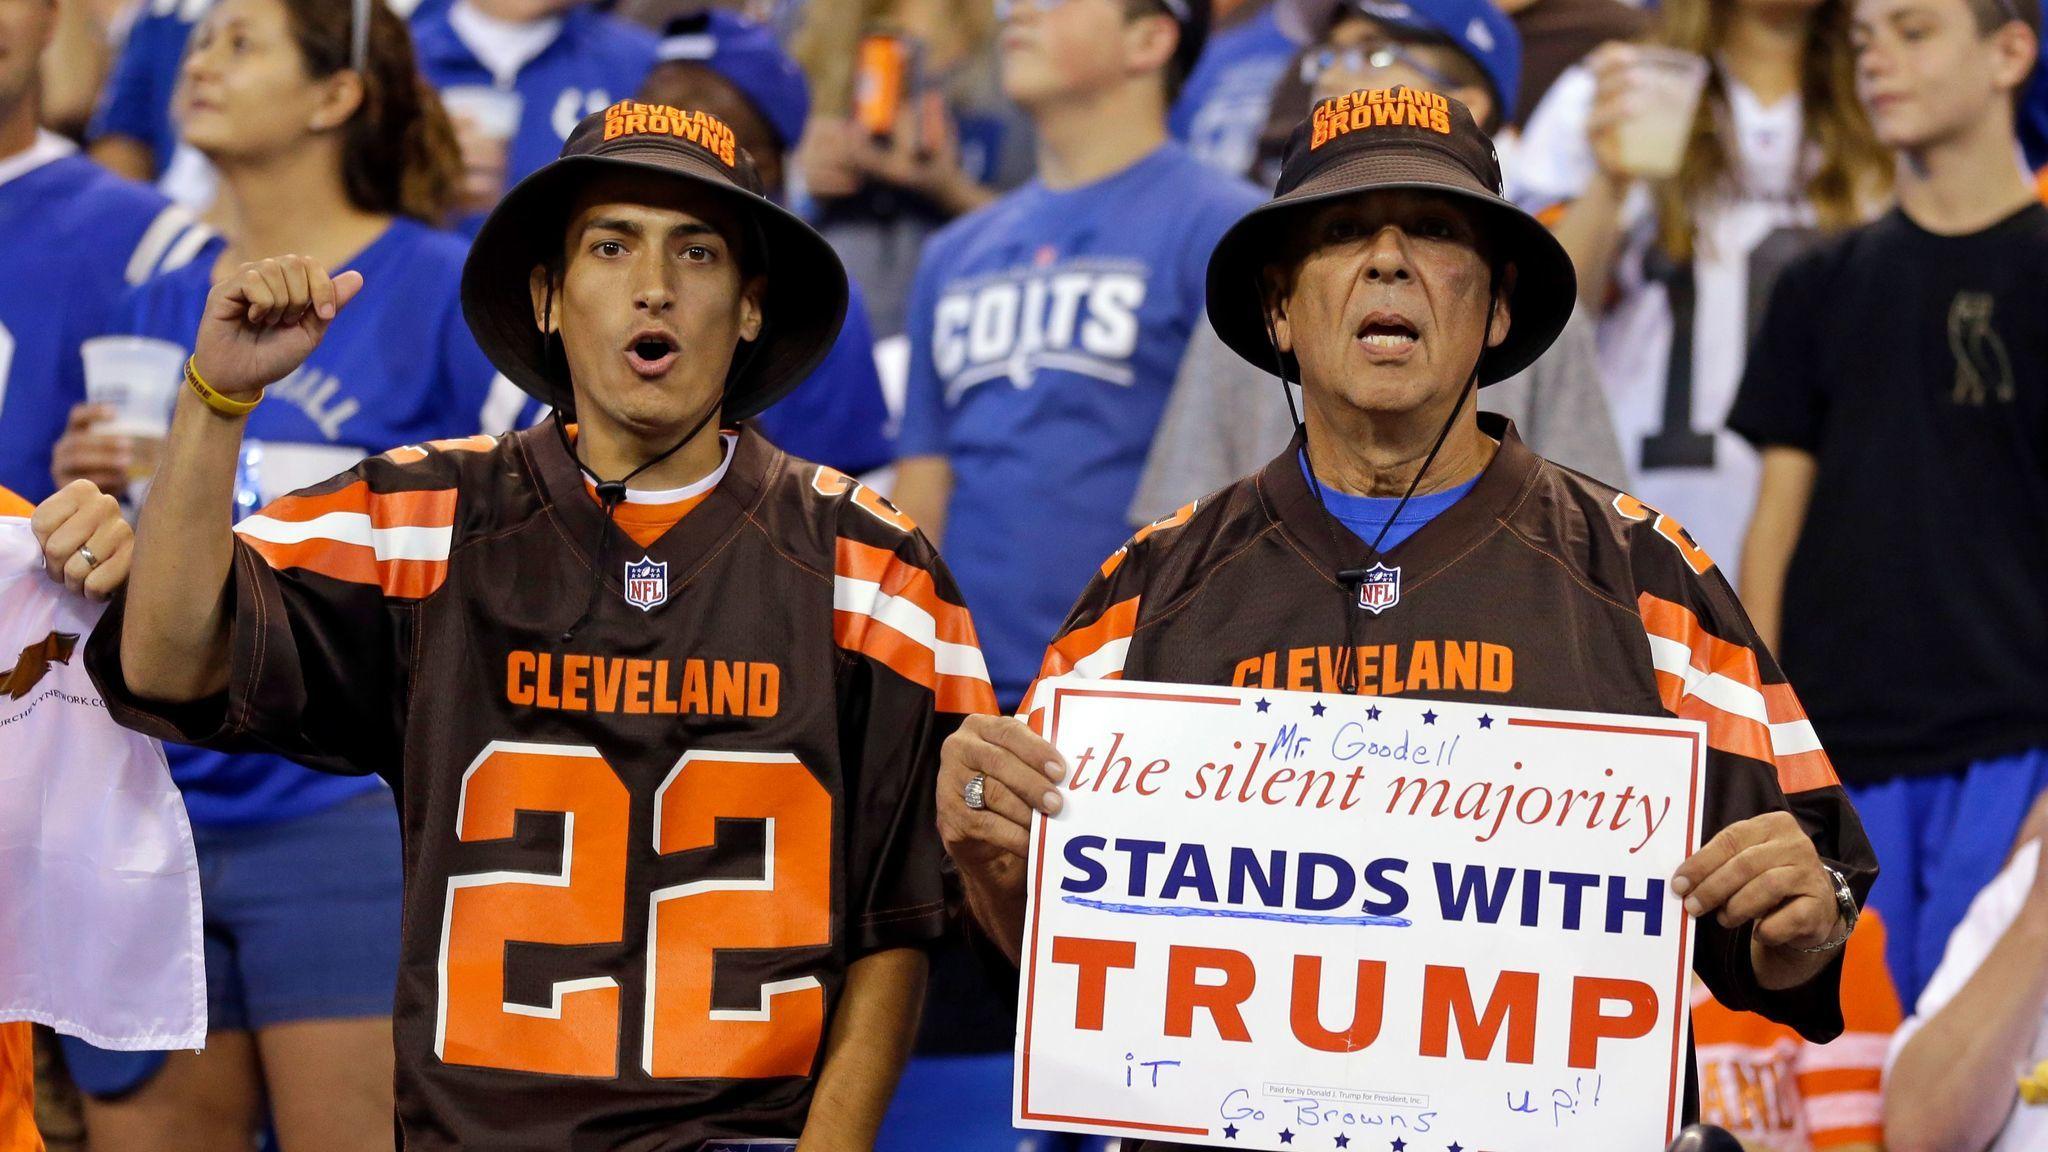 Cleveland Browns fans